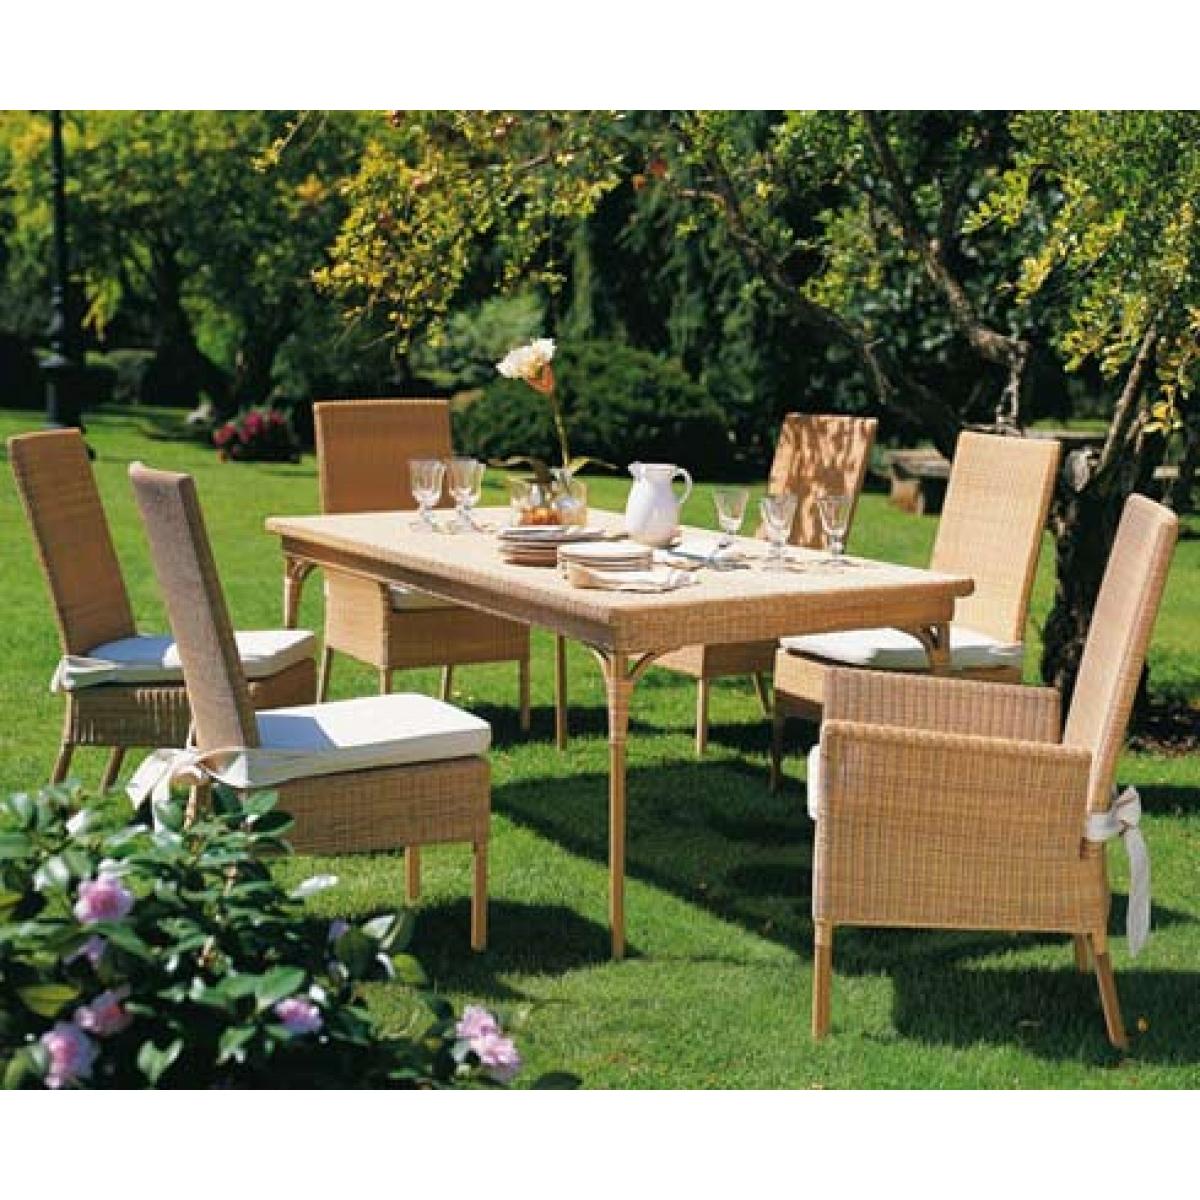 Tavoli in vendita su verdegarden for Vendita arredi da giardino